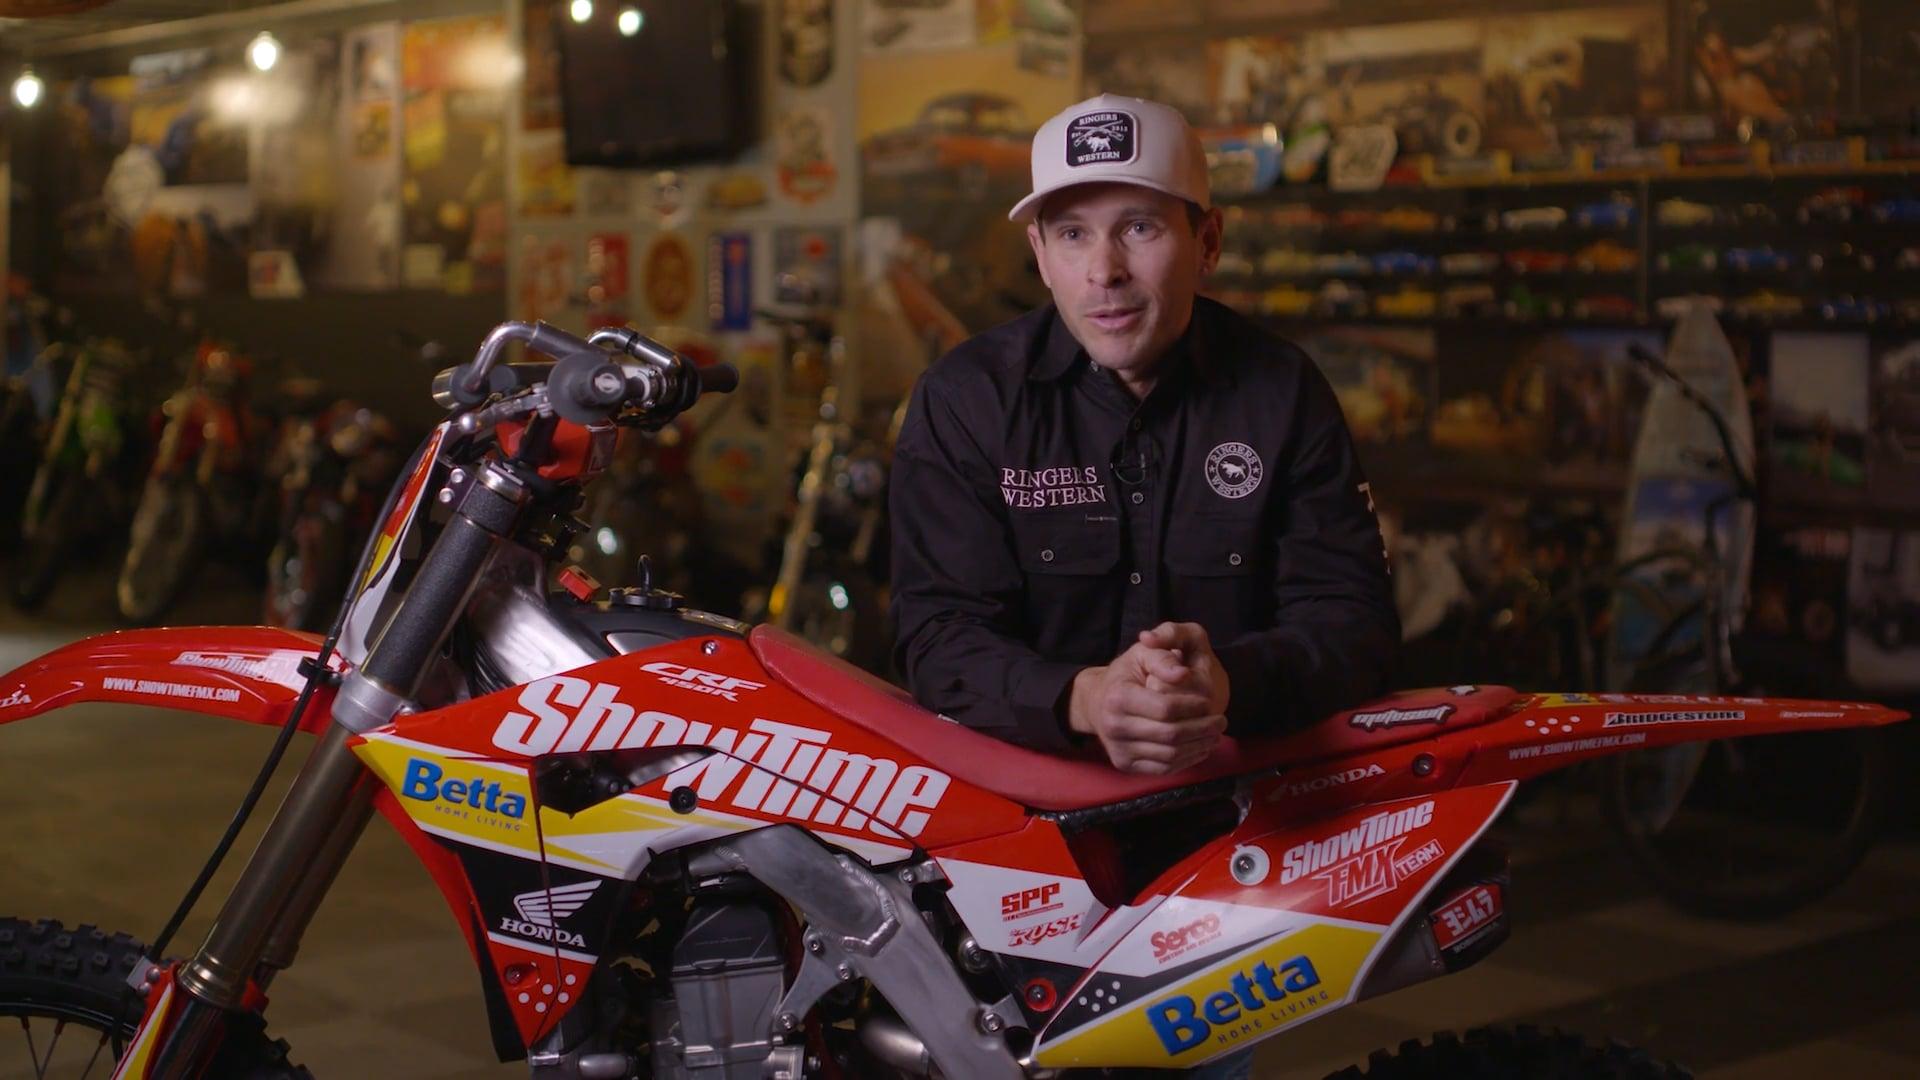 Meet the Riders   Freestyle Motocross